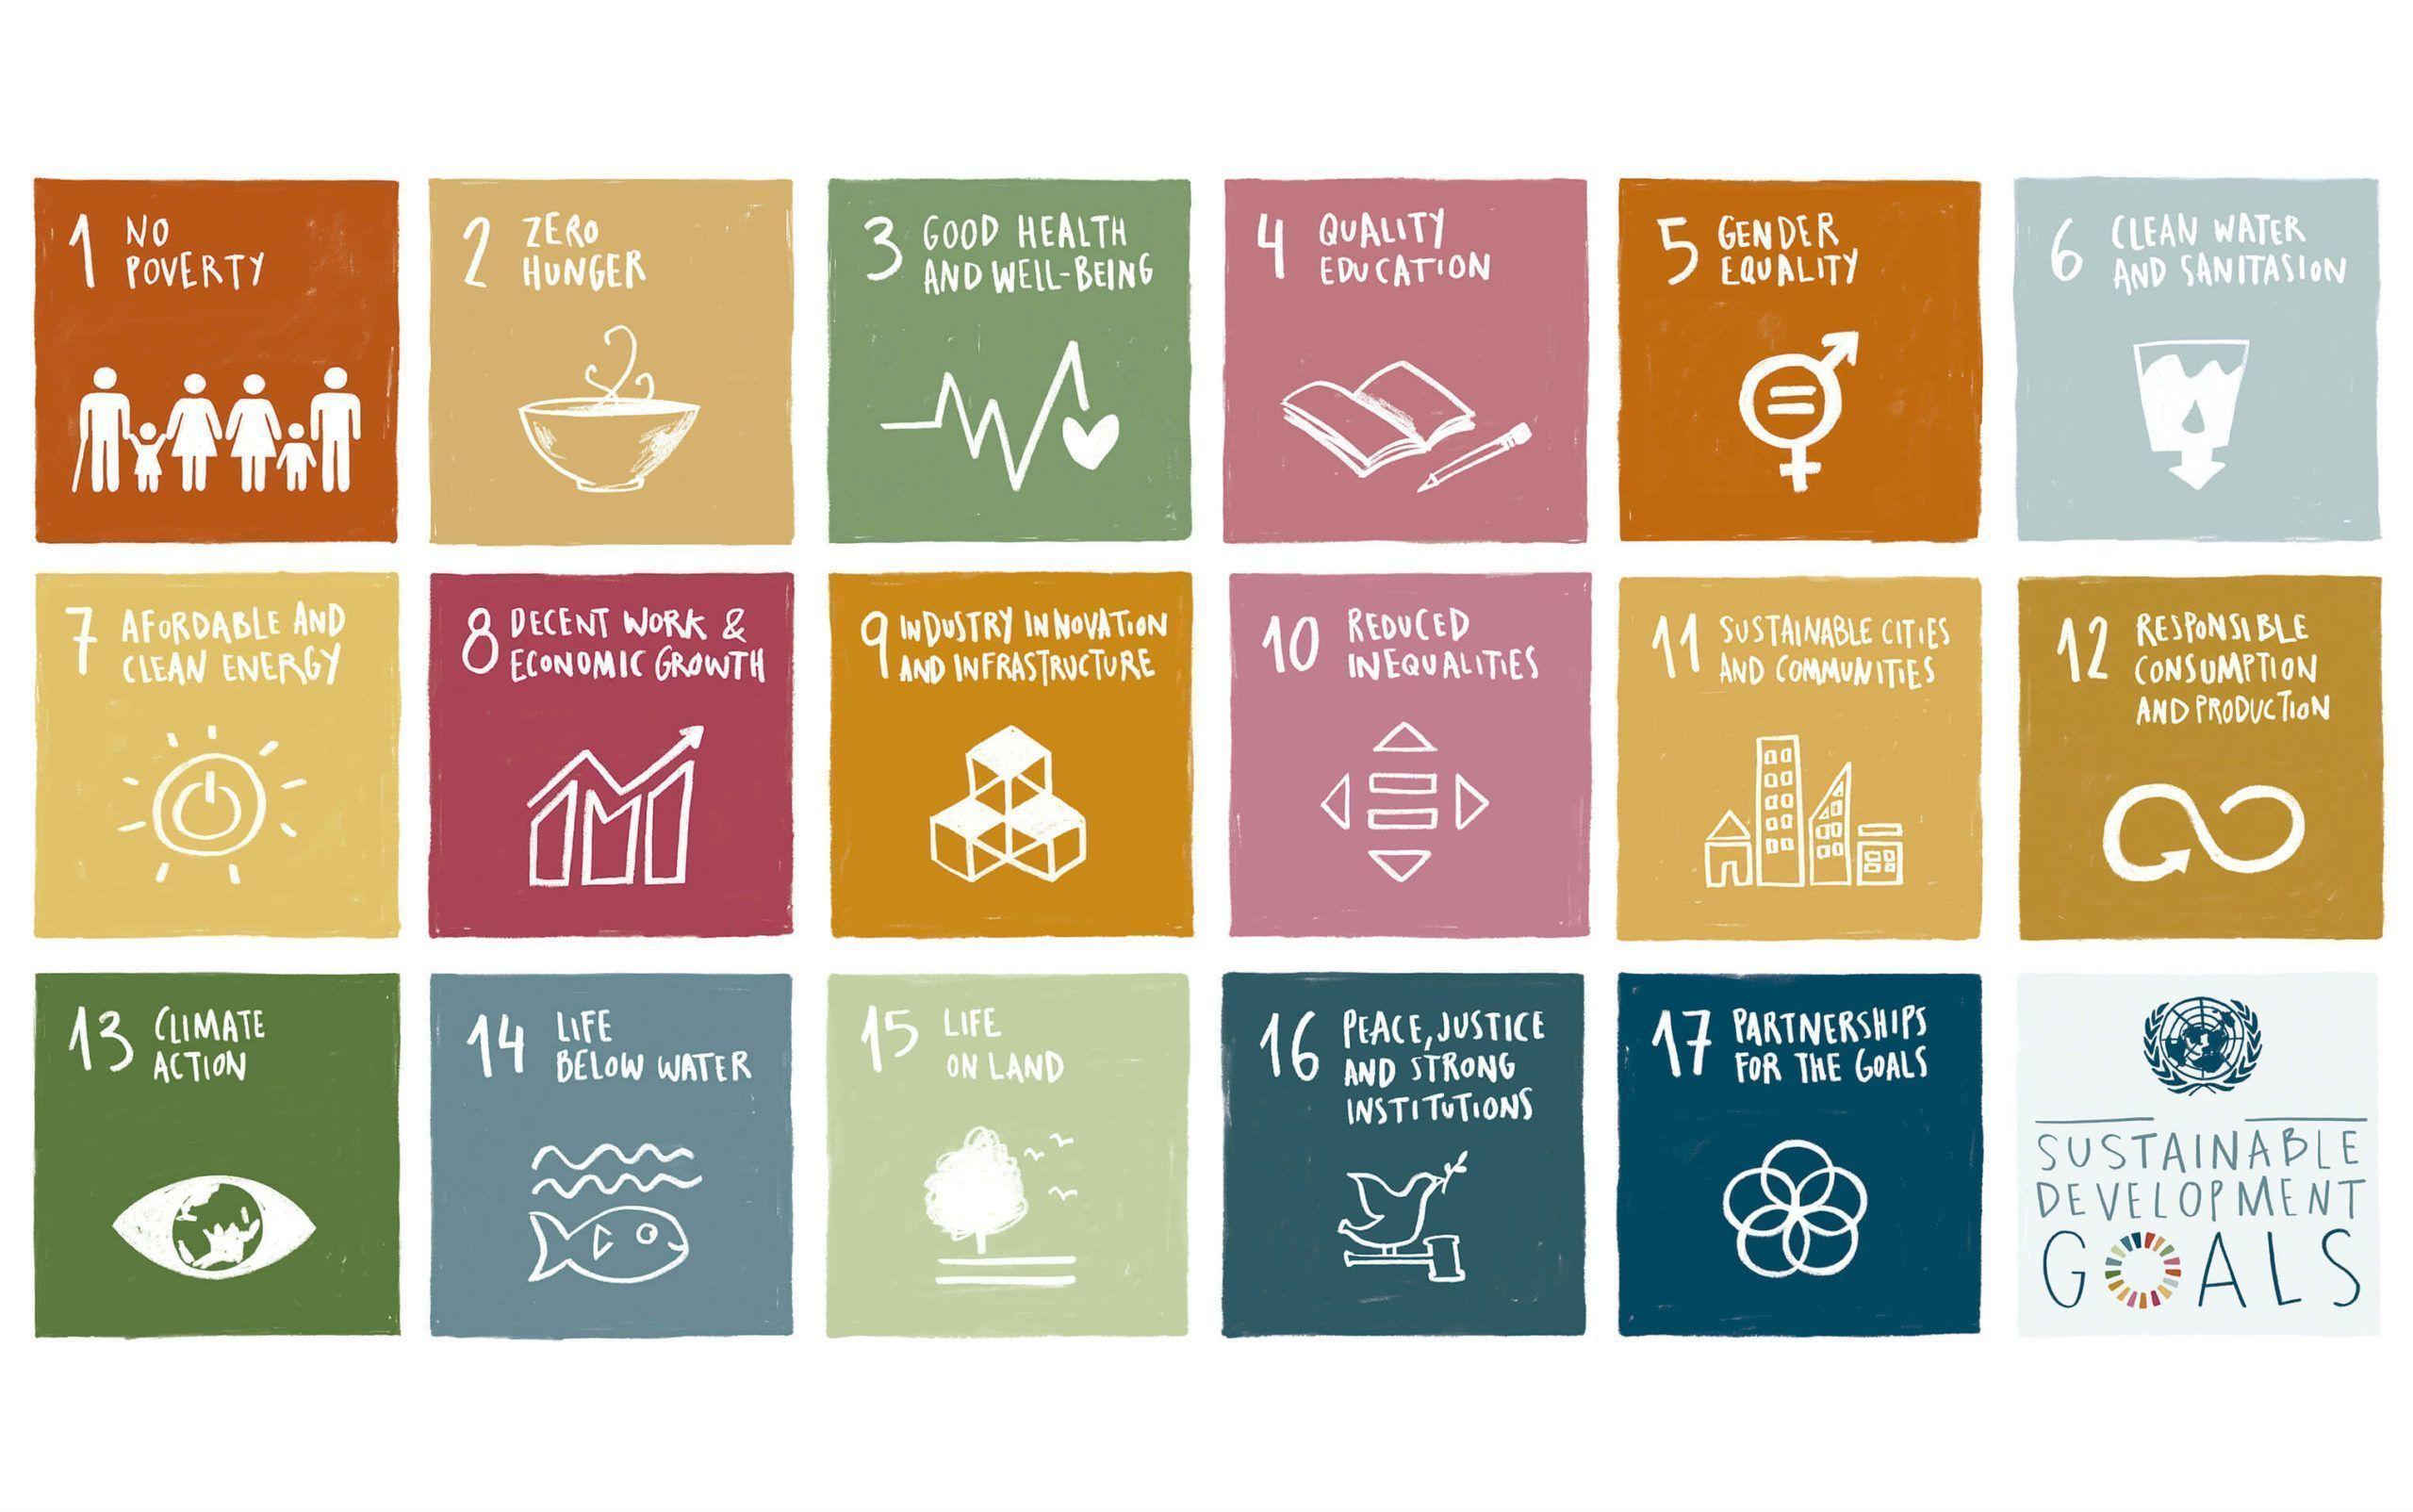 smart-way-to-start-doing-good-sustainable-development-goals_3